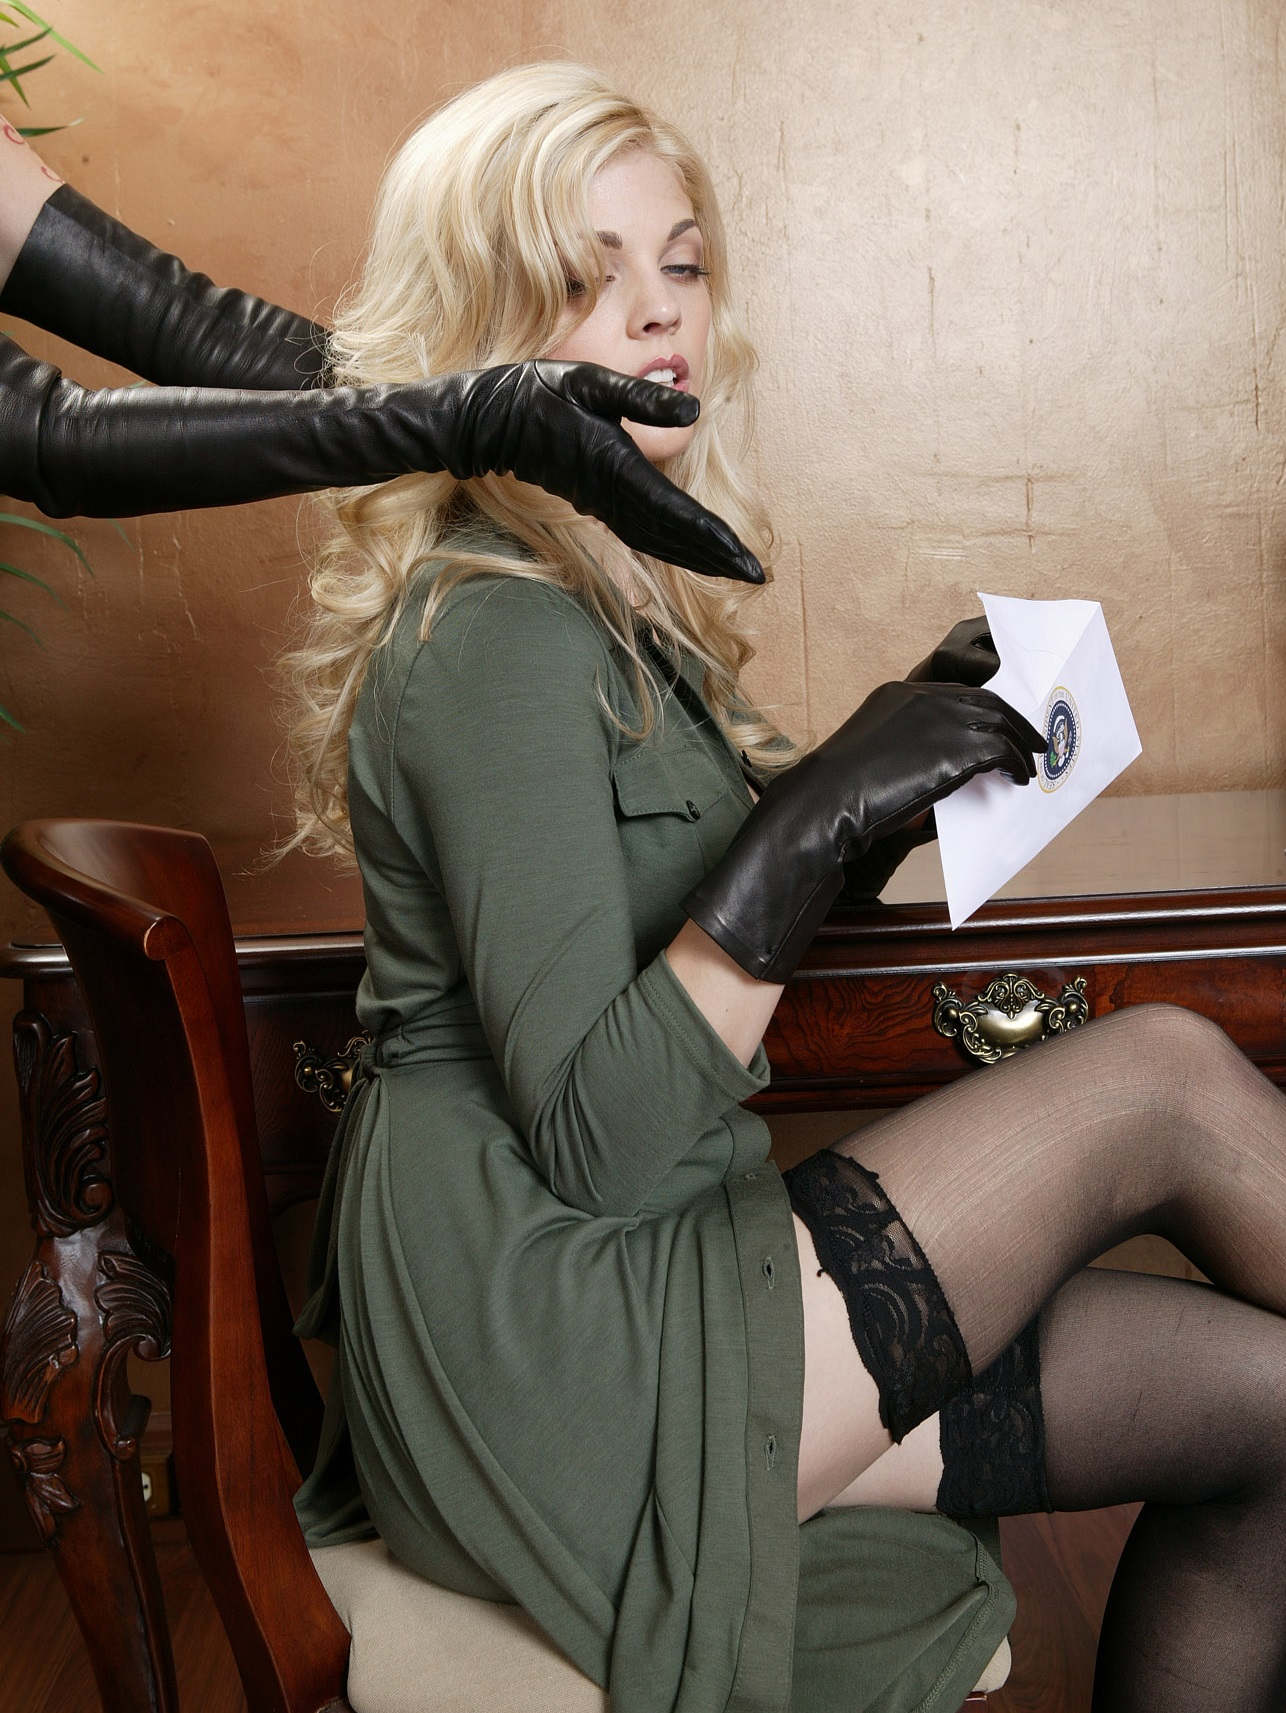 Look Spy girl bondage videos God